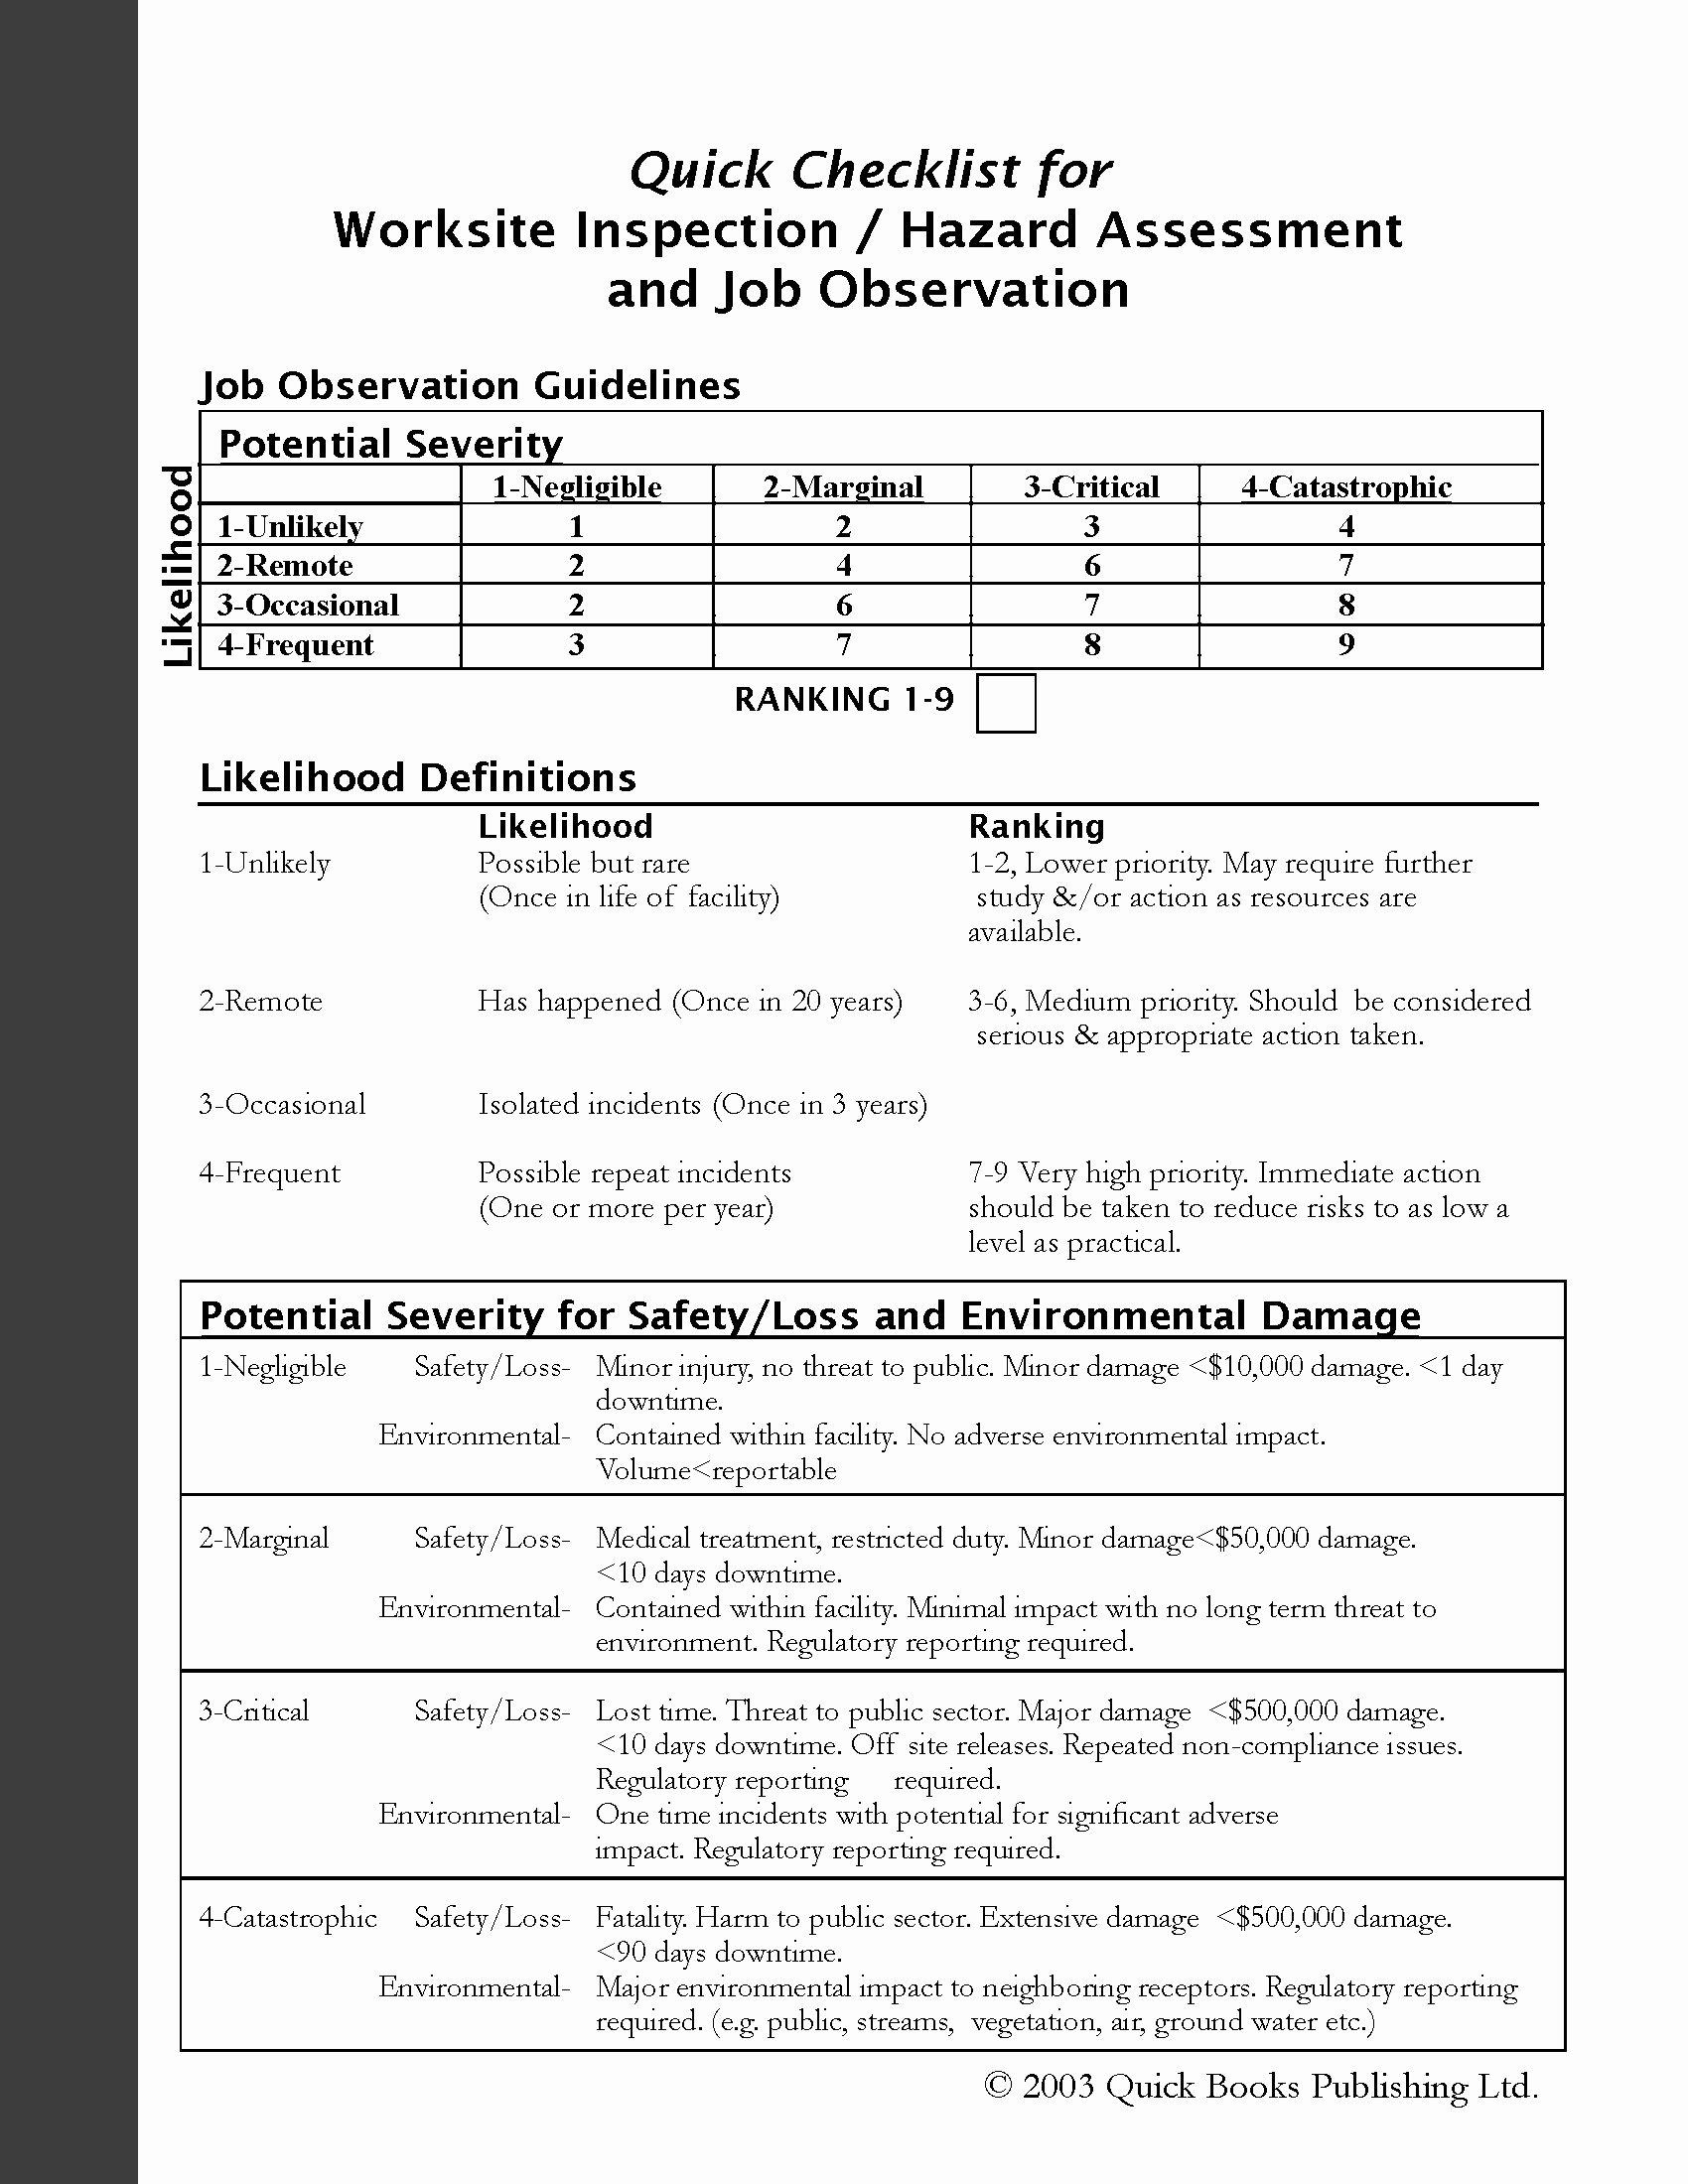 Hazard Analysis form Awesome Worksite Inspection Hazard assessment Checklist